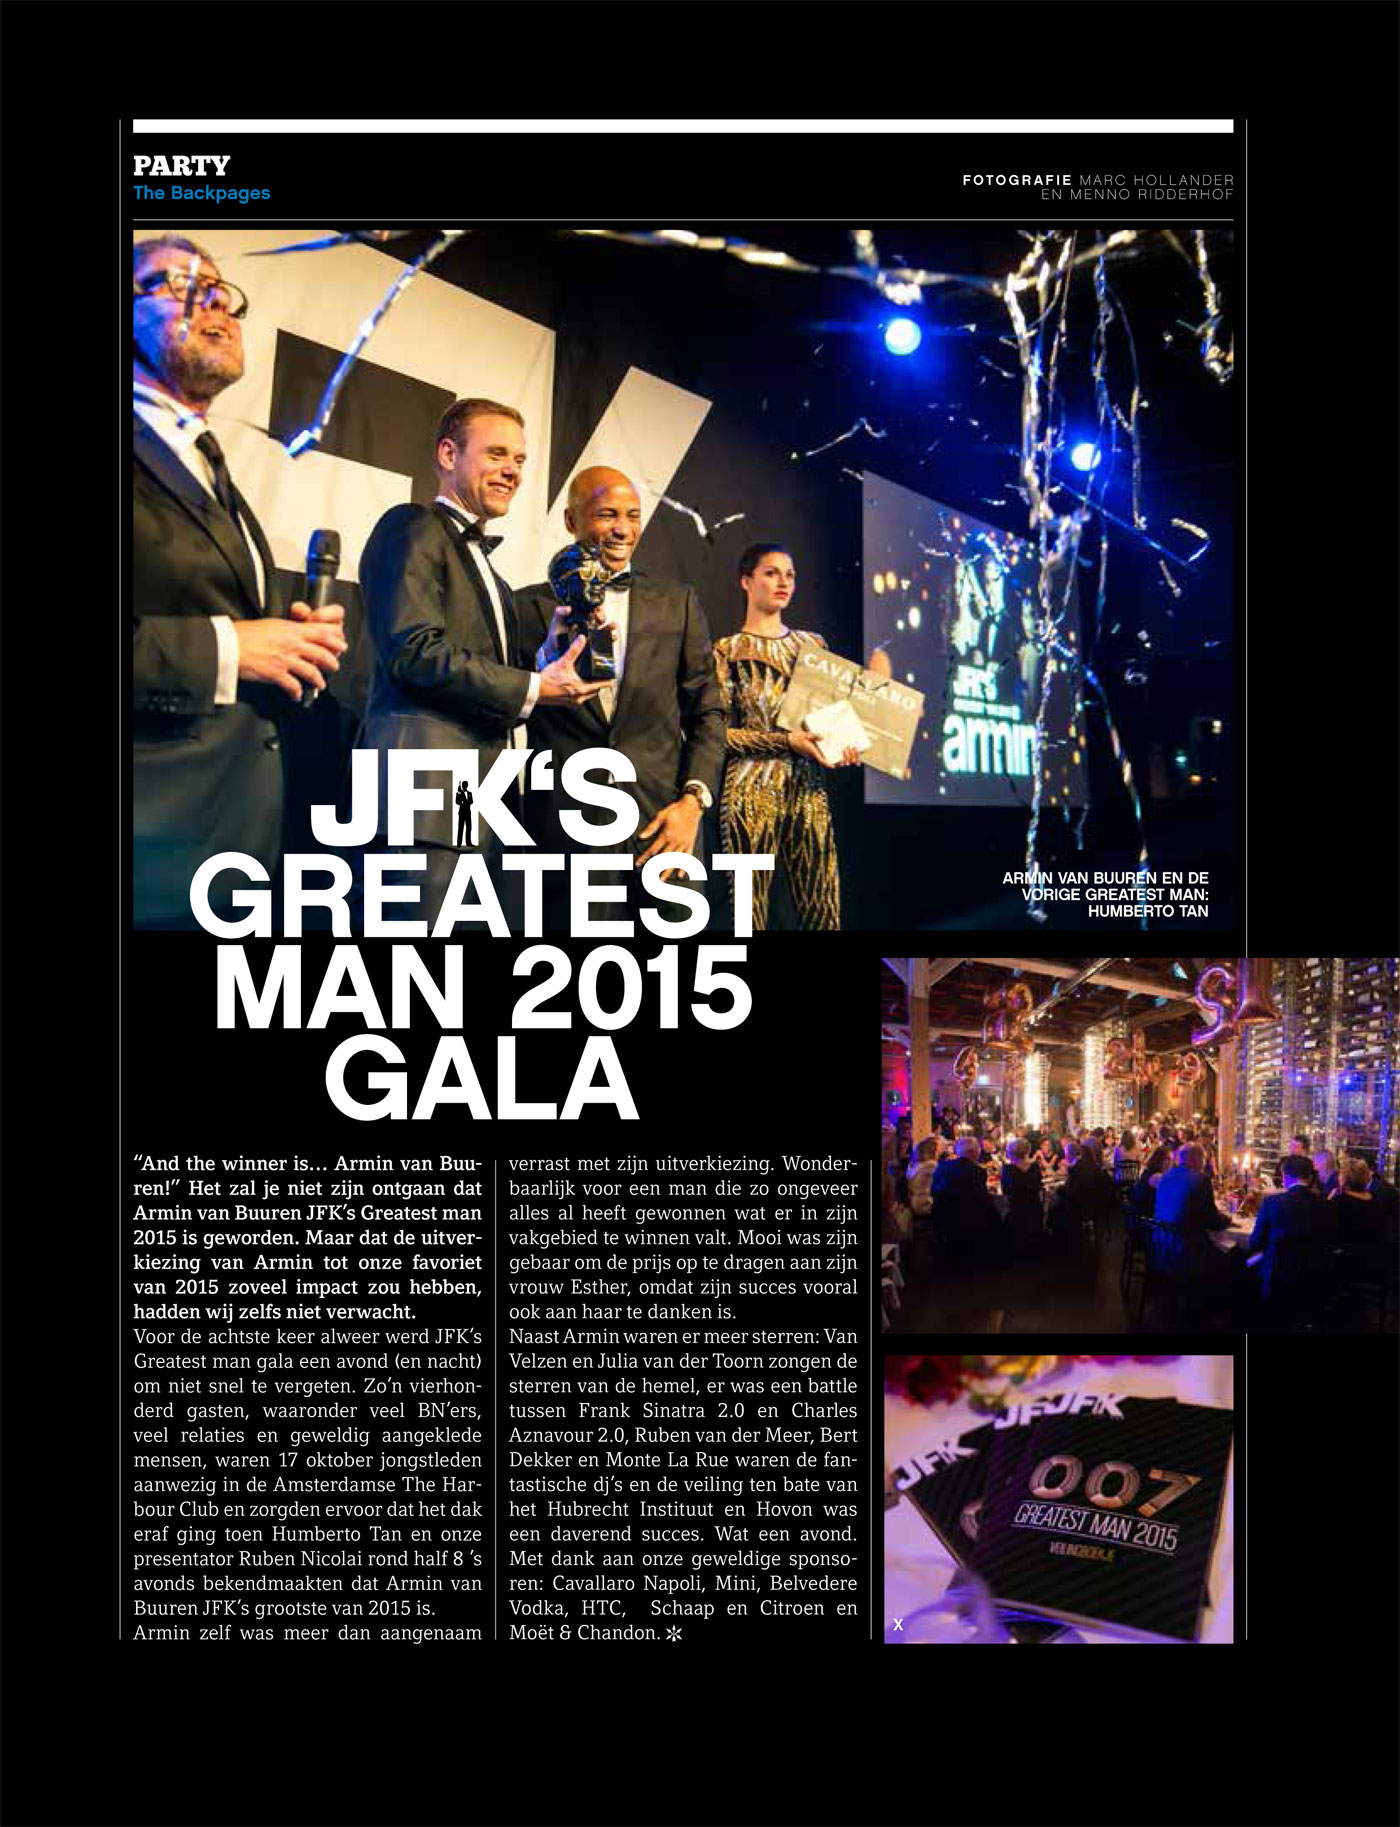 JFK_TBP_PartyPics-1